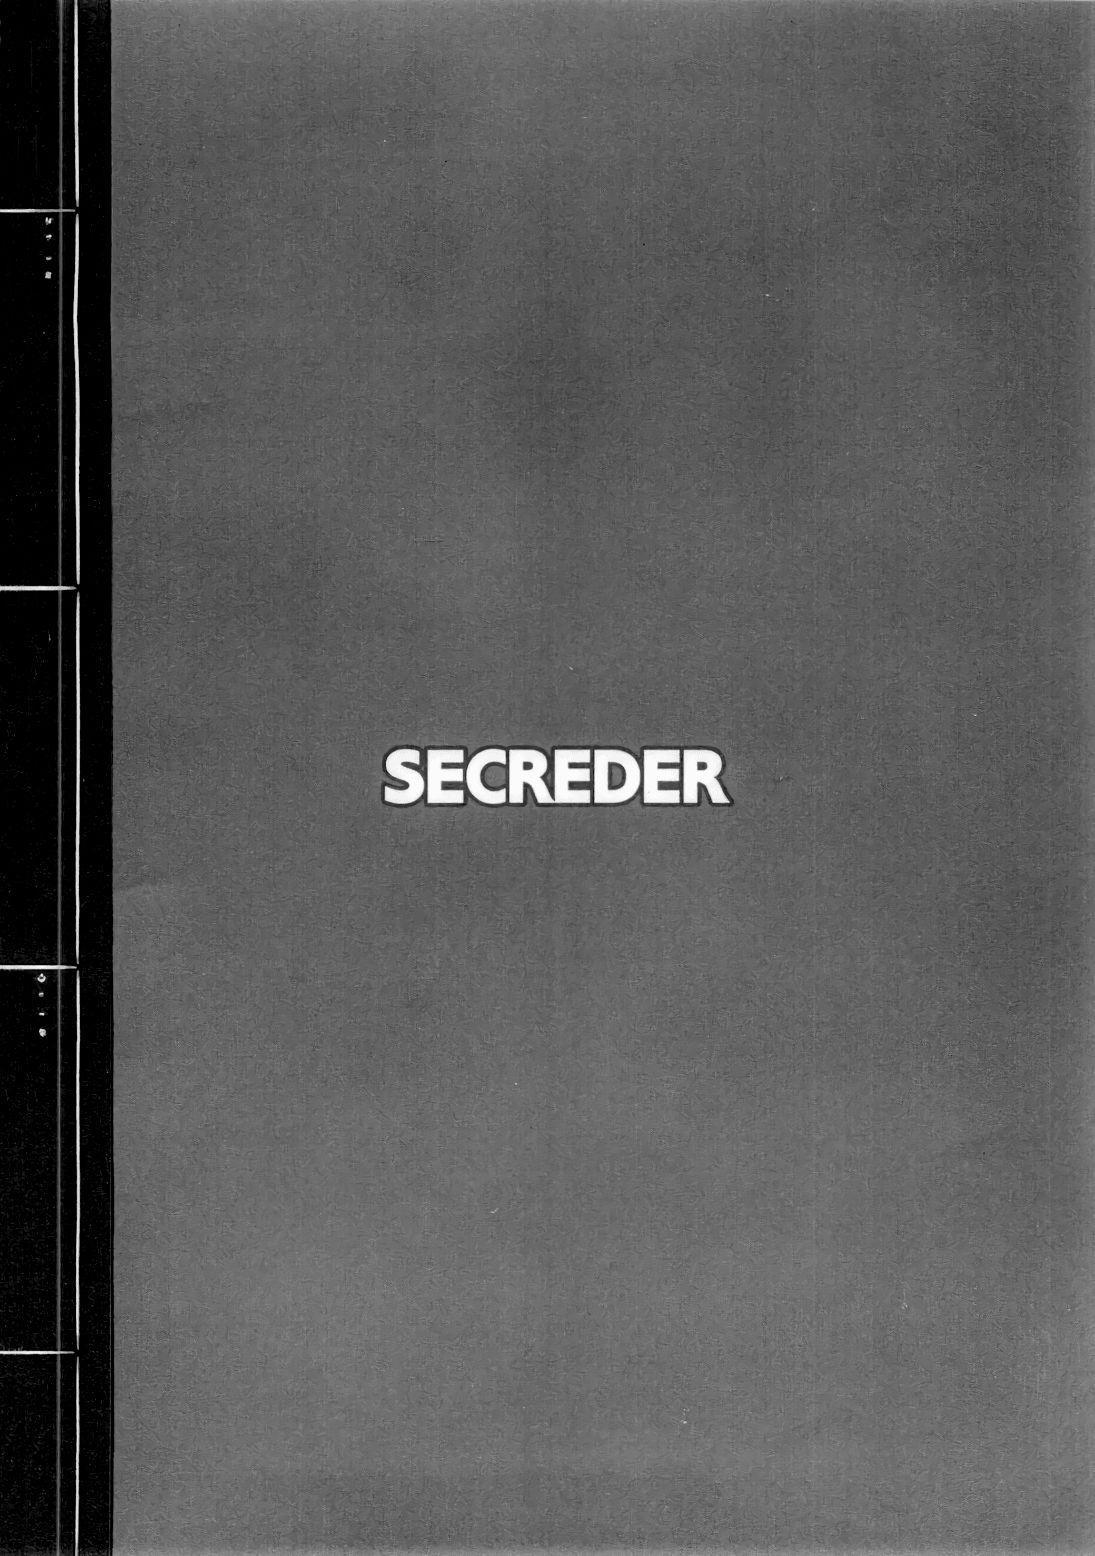 (C73) [SECREDER (Masaki)] Ayakashi Douchuu ~Kyuusai Copy-shi~ | Ayakashi On The Way ~Help Copy Magazine~ [English] [S.T.A.L.K.E.R.] 7